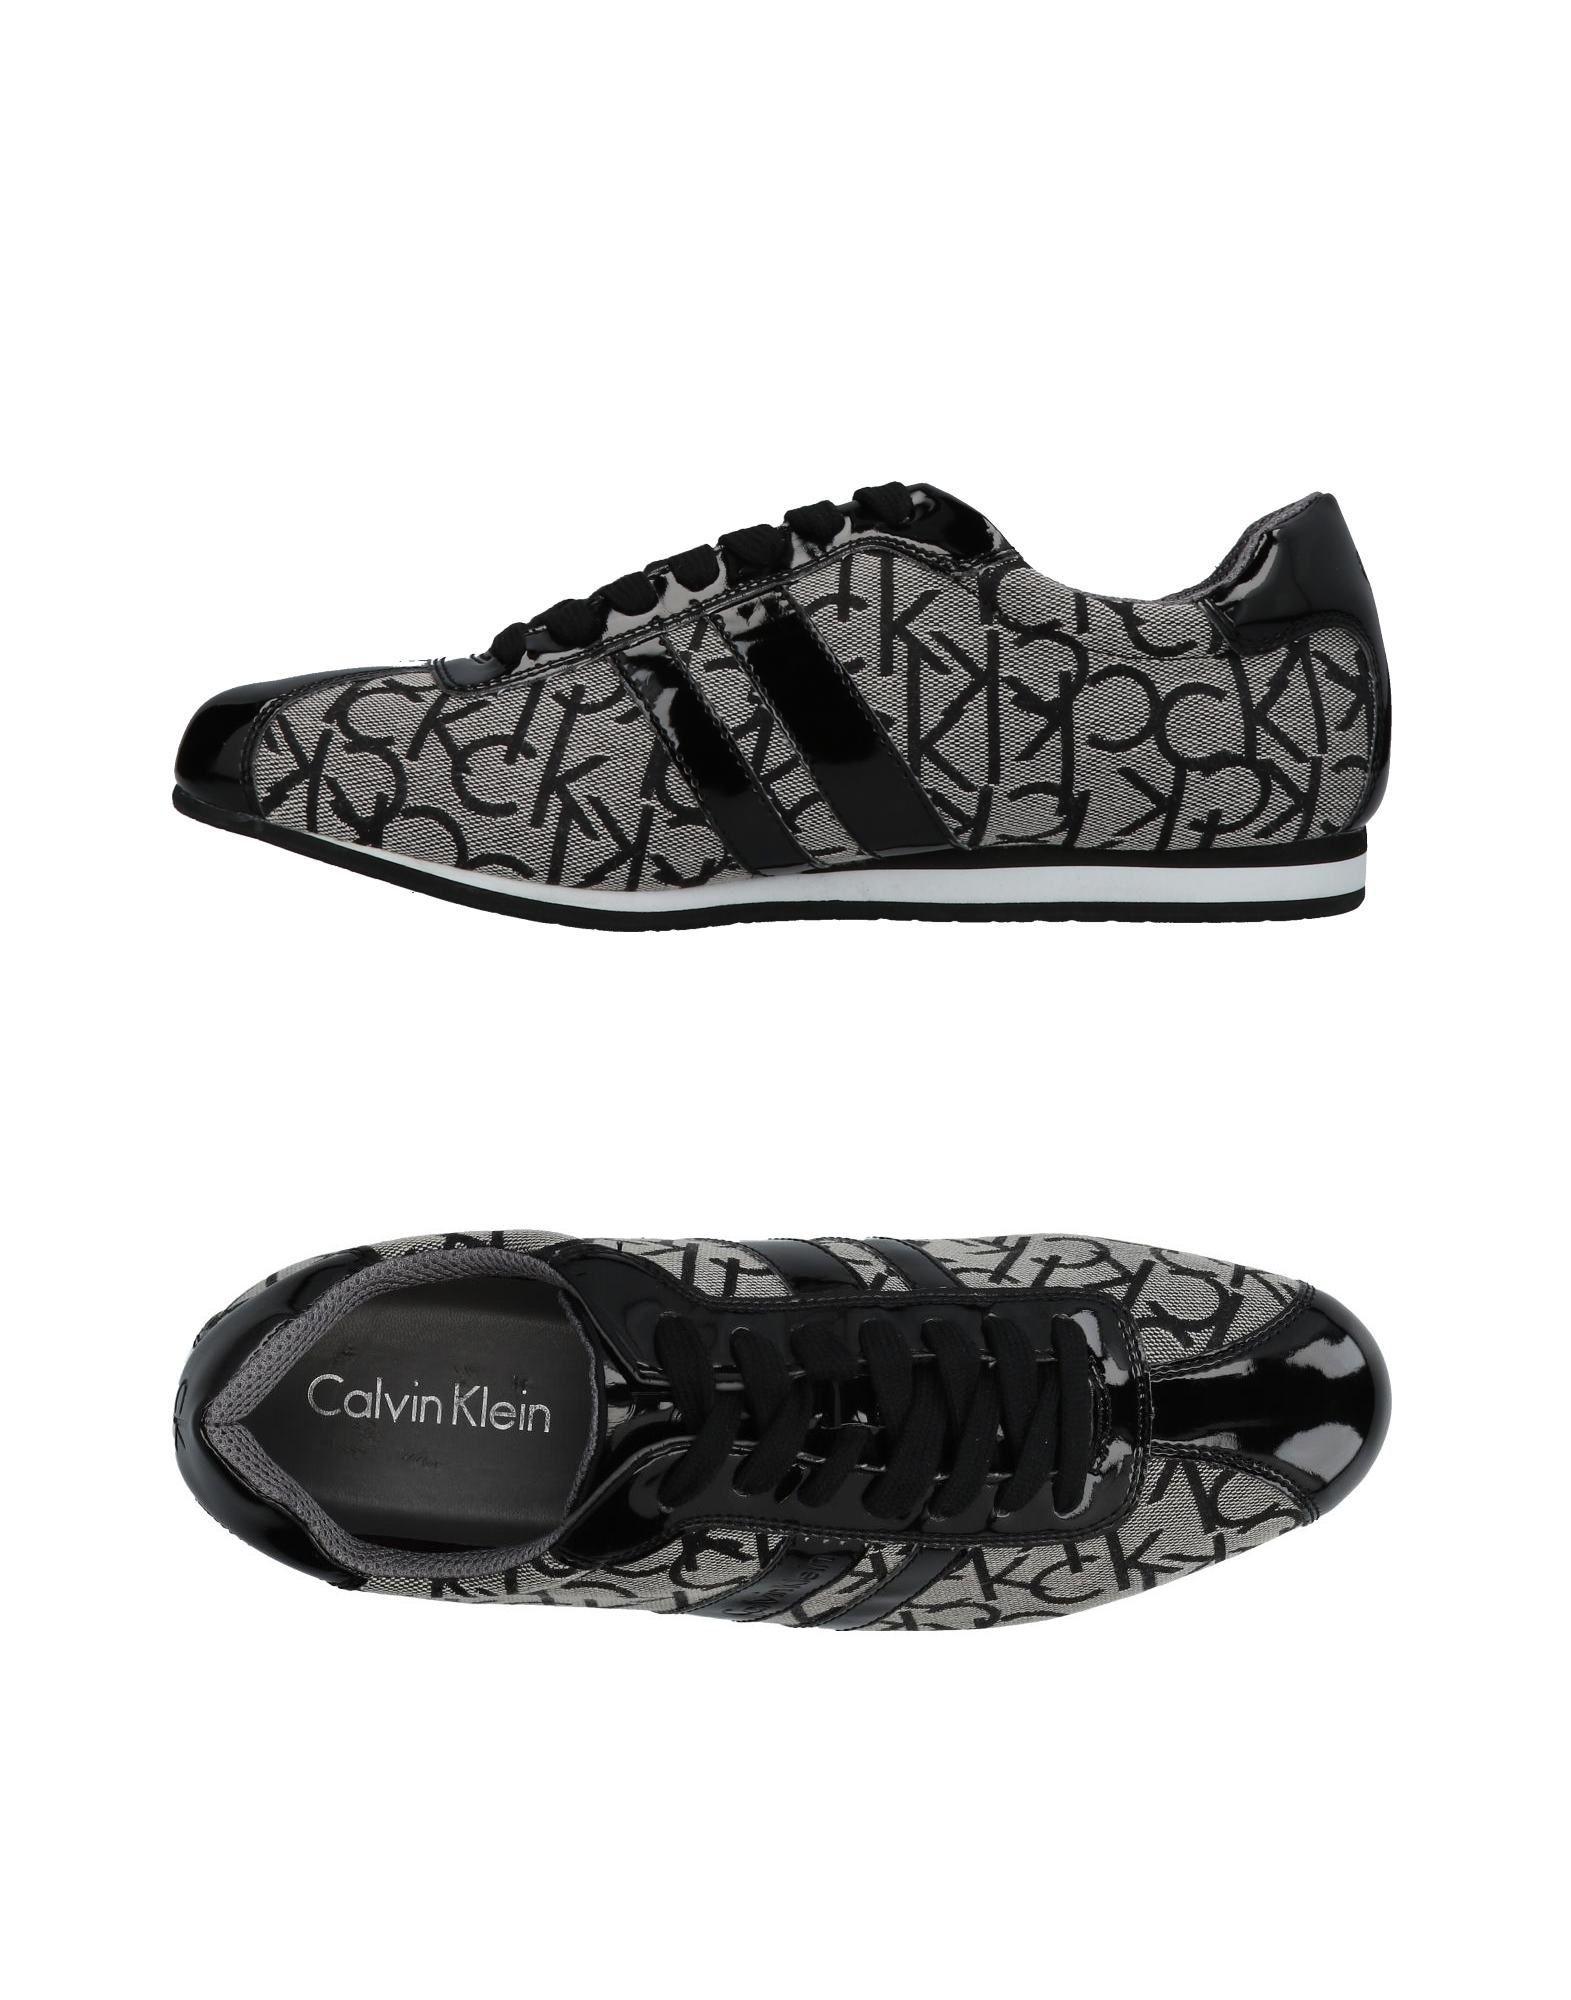 CALVIN KLEIN Низкие кеды и кроссовки кроссовки calvin klein collection кроссовки